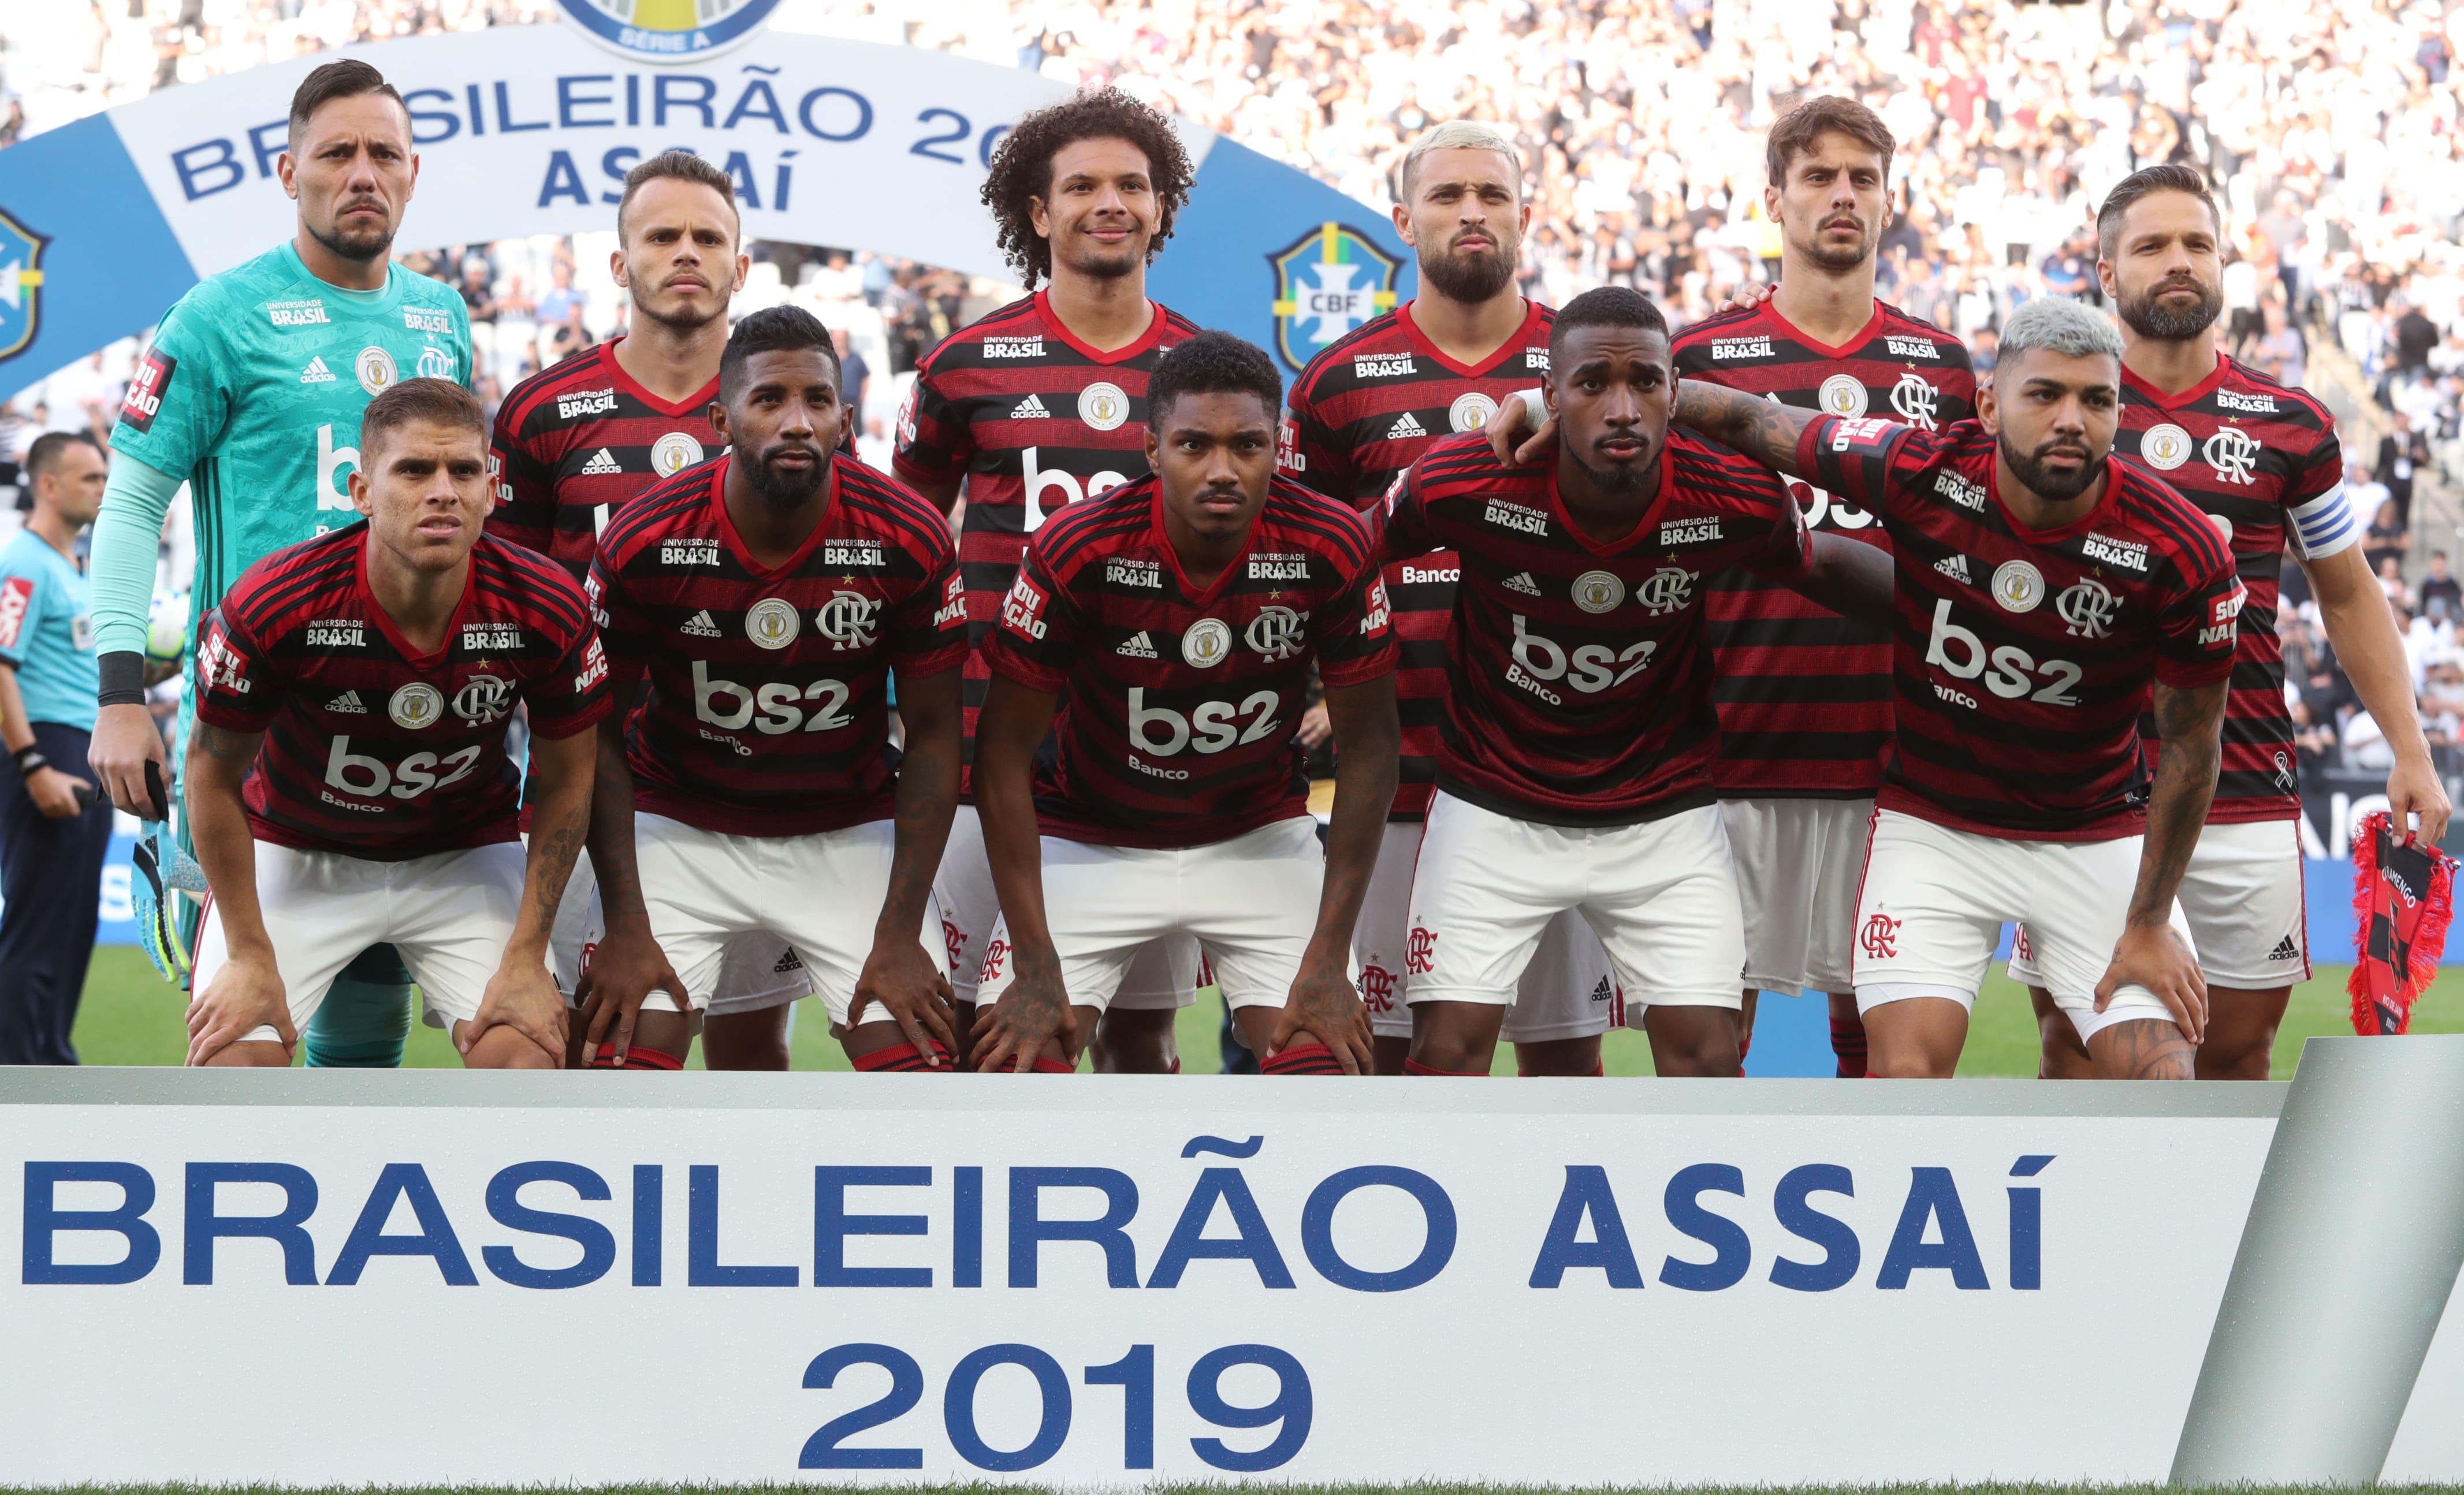 Flamengo win Copa Libertadores with amazing comeback against River Plate